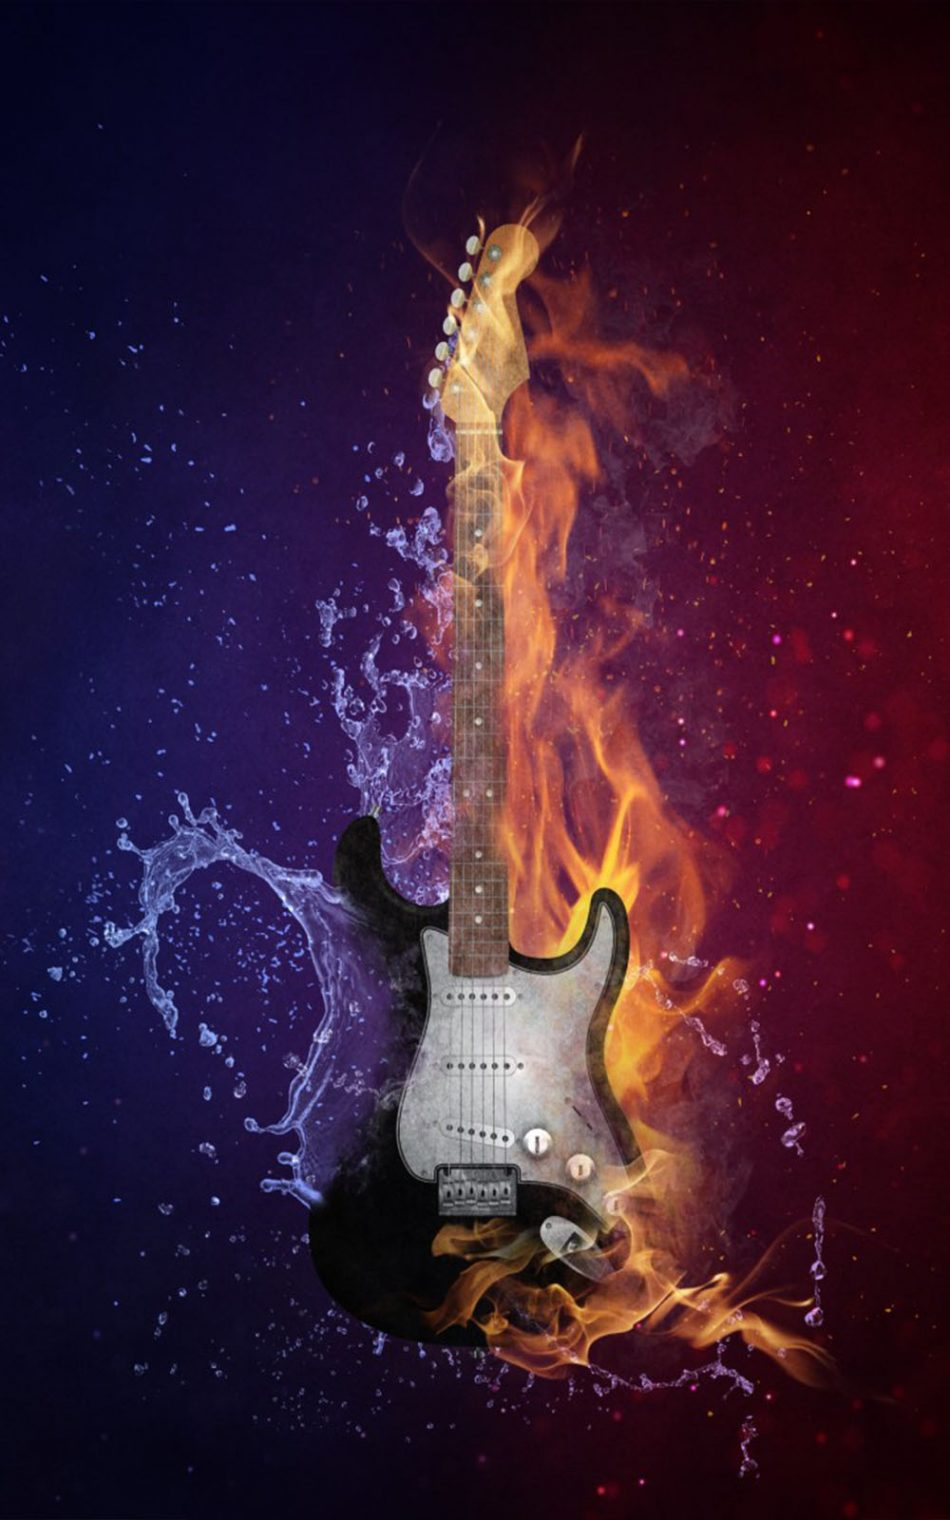 Guitar Fire Water 4k Ultra Hd Mobile Wallpaper